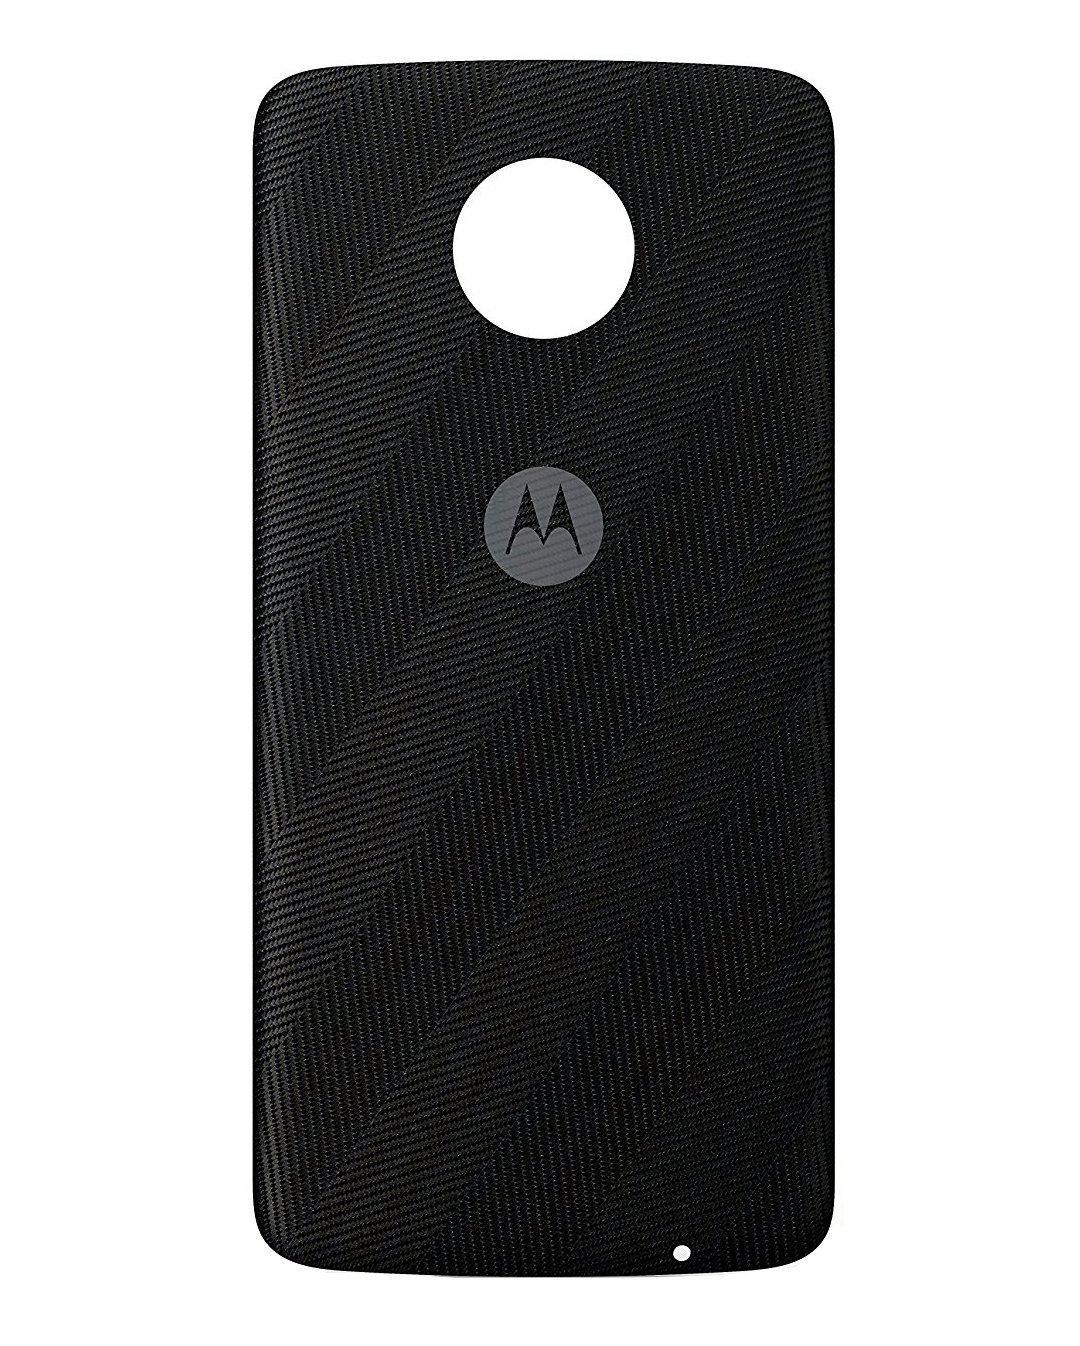 Moto Mod Style Shell for Motorola Moto Z Phone Case (Herringbone Nylon) by Marstak